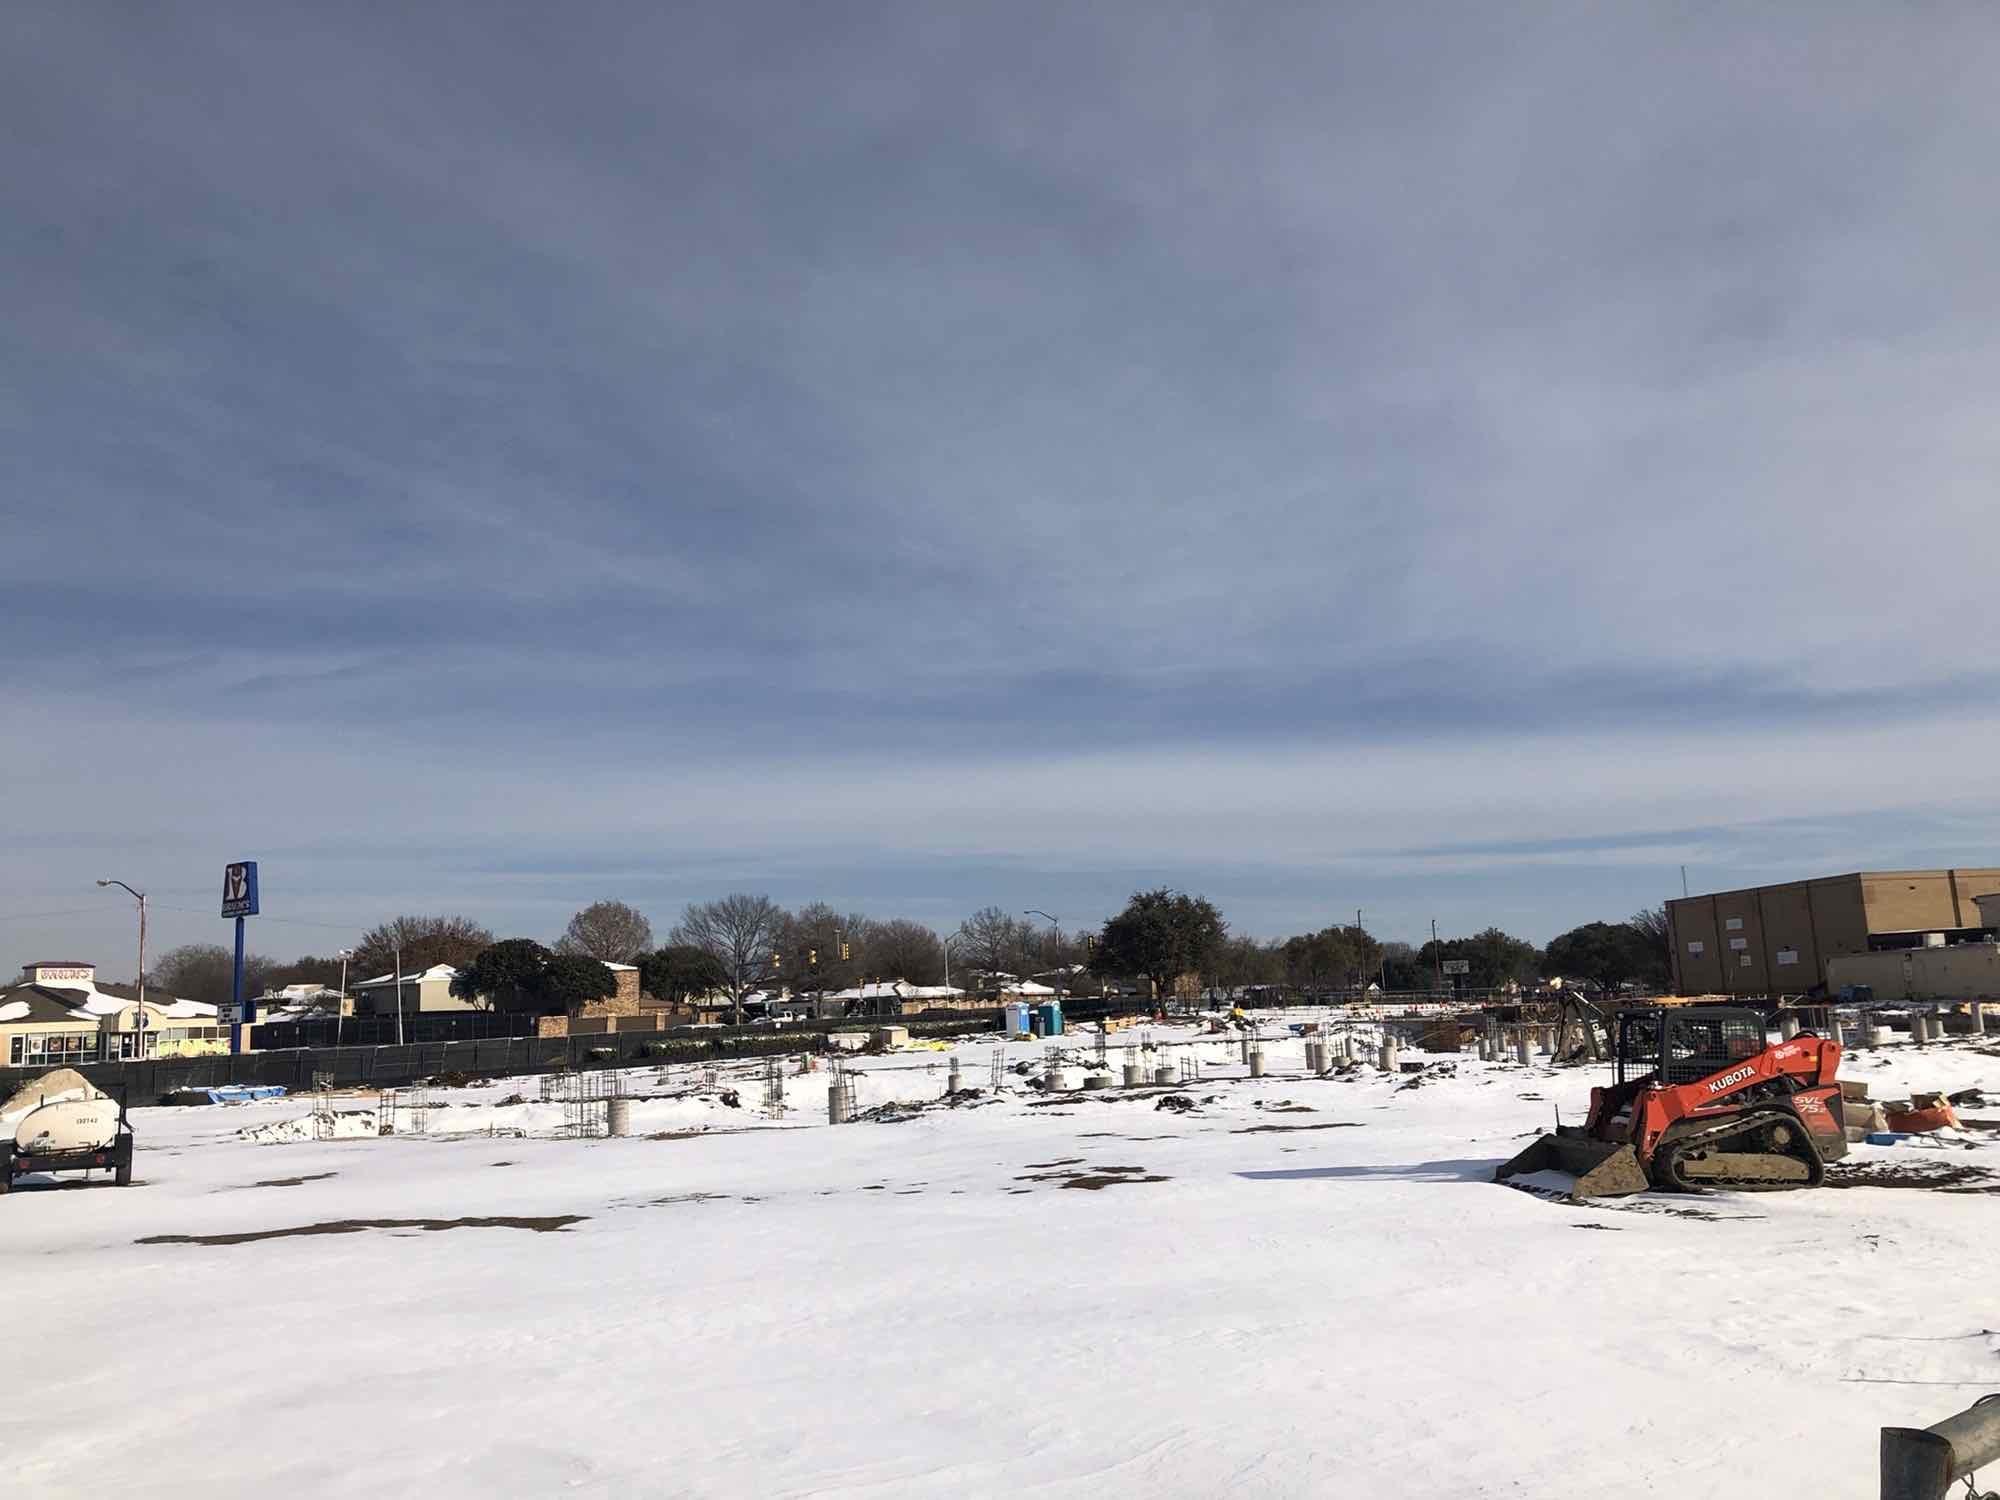 Snow at South Hills! image 1